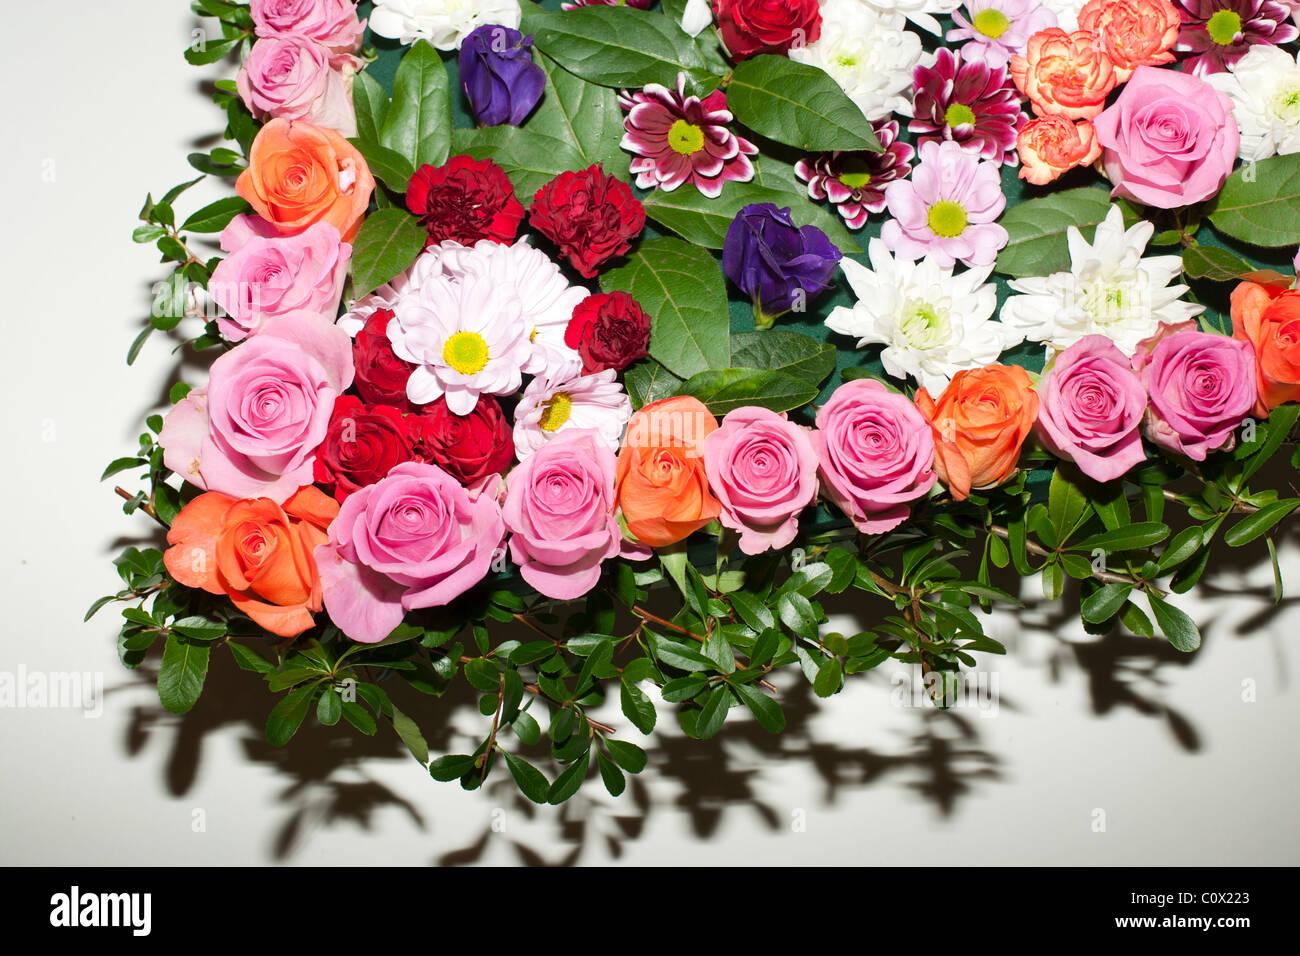 Funeral flowers dad stock photos funeral flowers dad stock images heart shaped funeral flowers stock image izmirmasajfo